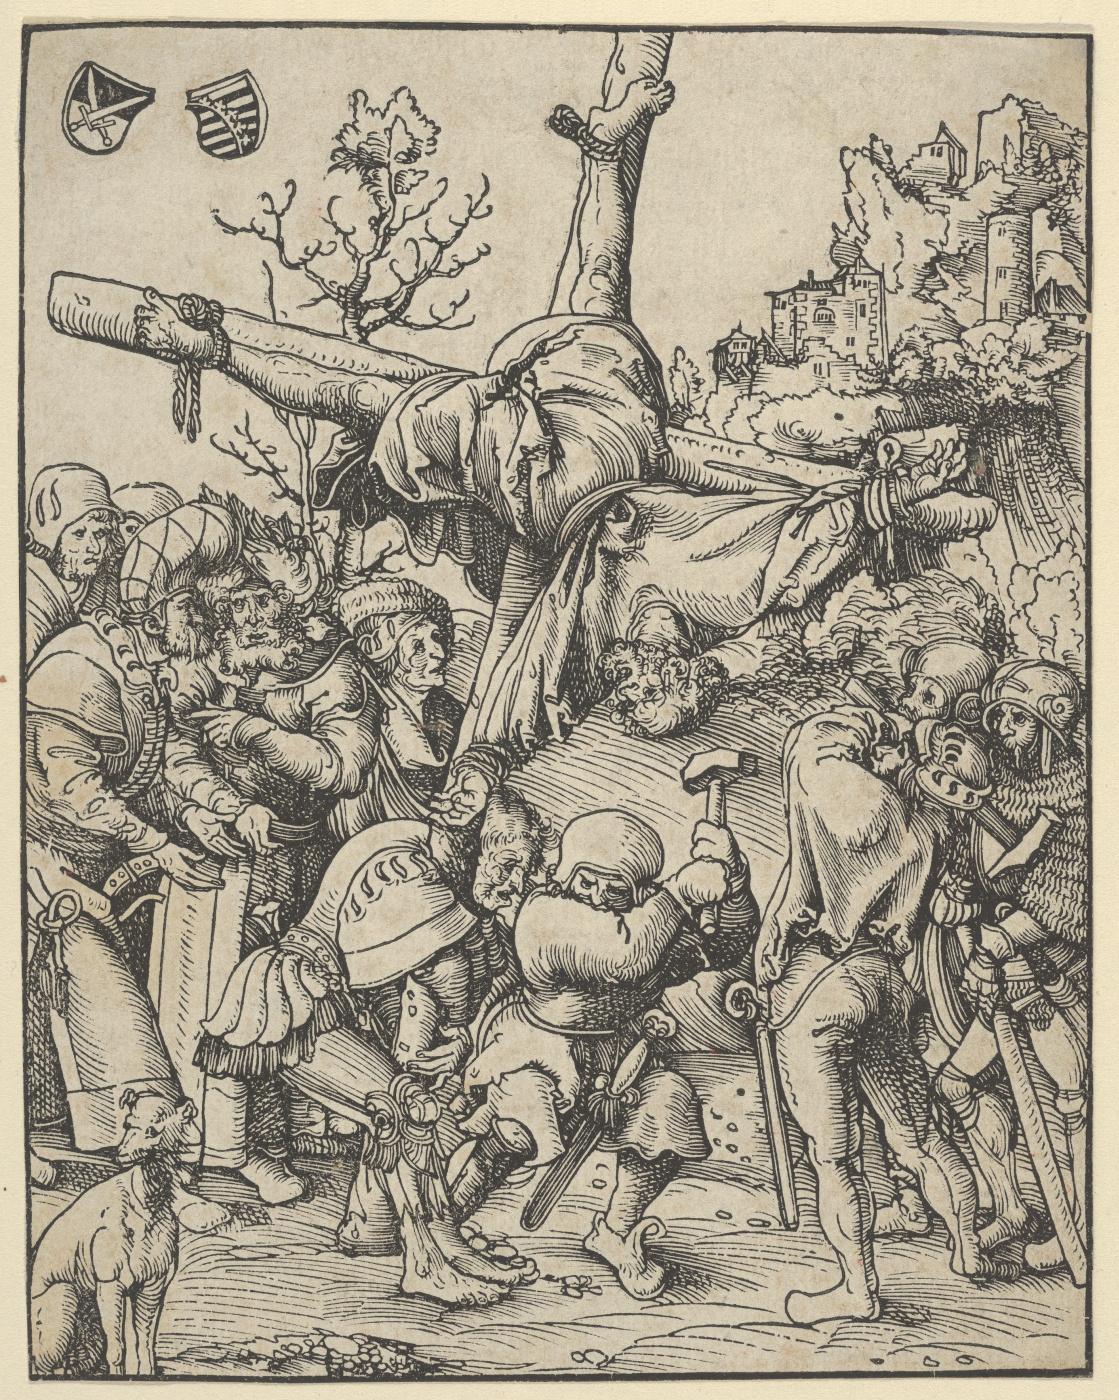 Lucas Cranach the Elder. The Apostle Peter